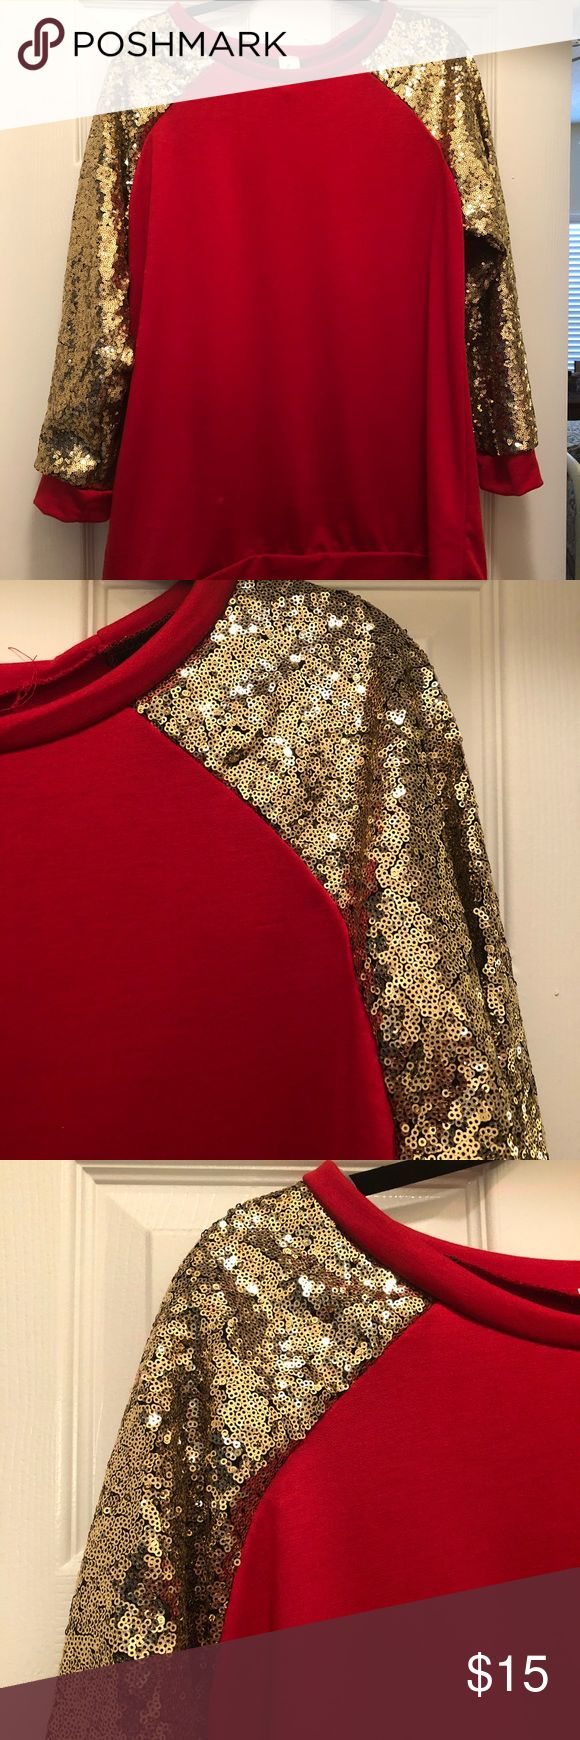 "Gold Sequin & red ""baseball cut"" sweatshirt. NWOT Gold sequin sleeves, red sweatshirt body, baseball-style sweatshirt. Size 2x. Banded bottom. 3/4 sleeves. Never worn. Tops Sweatshirts & Hoodies"